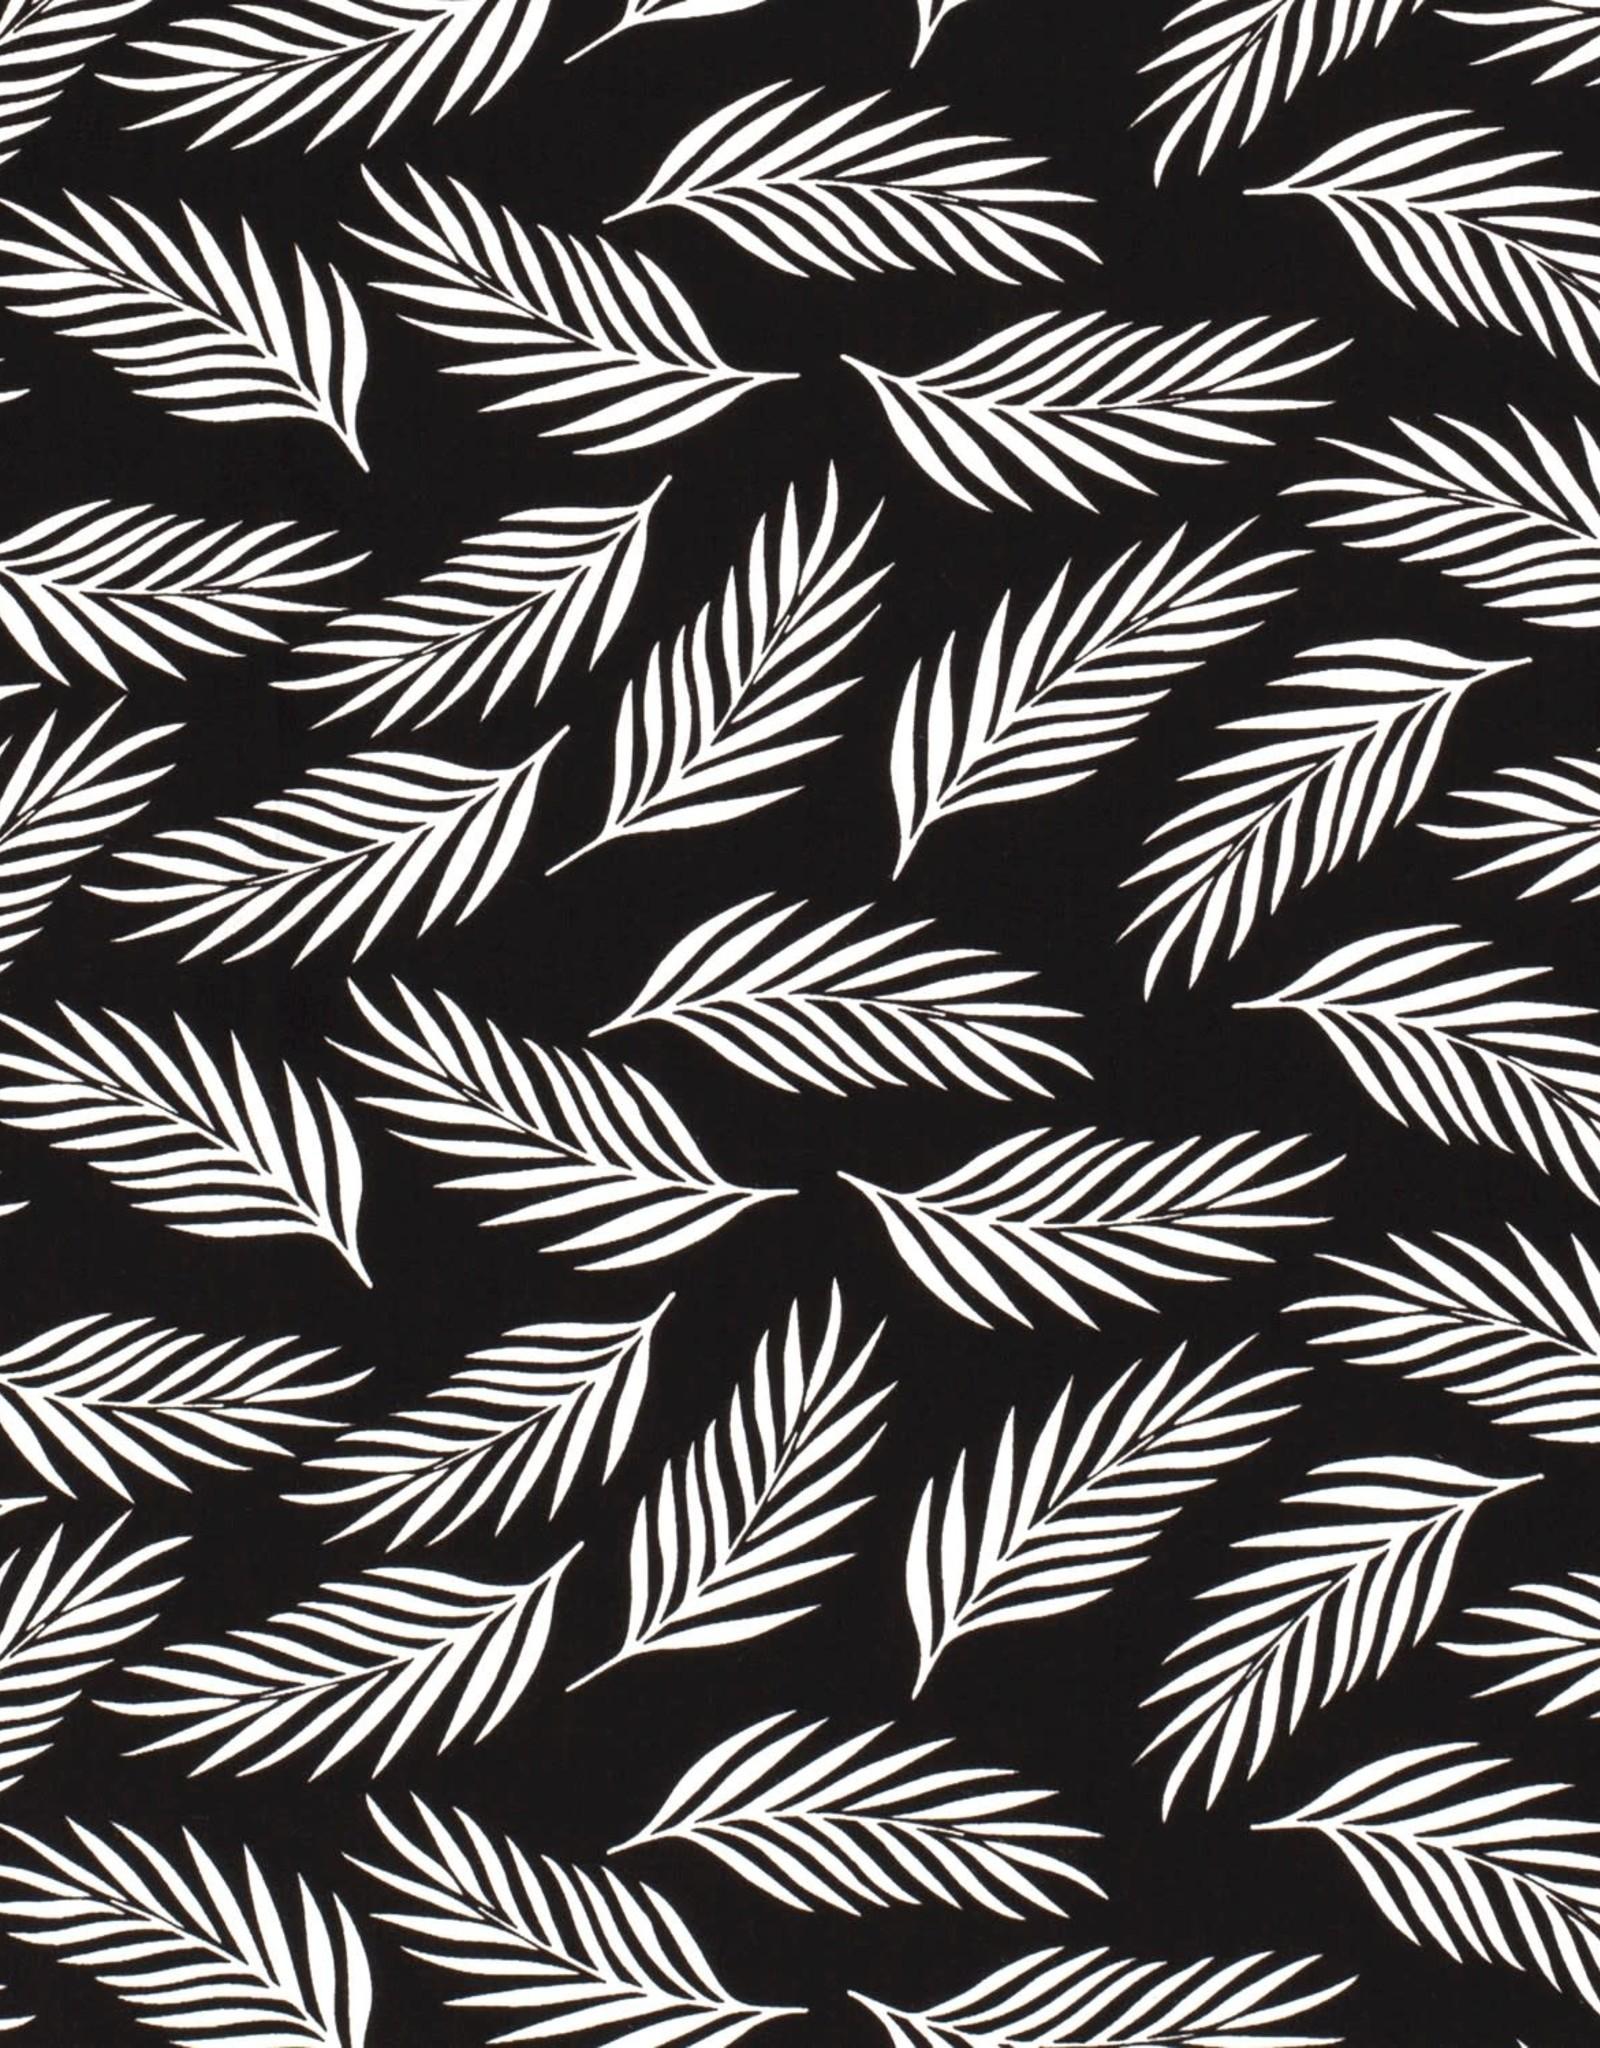 Viscose - White Leaves